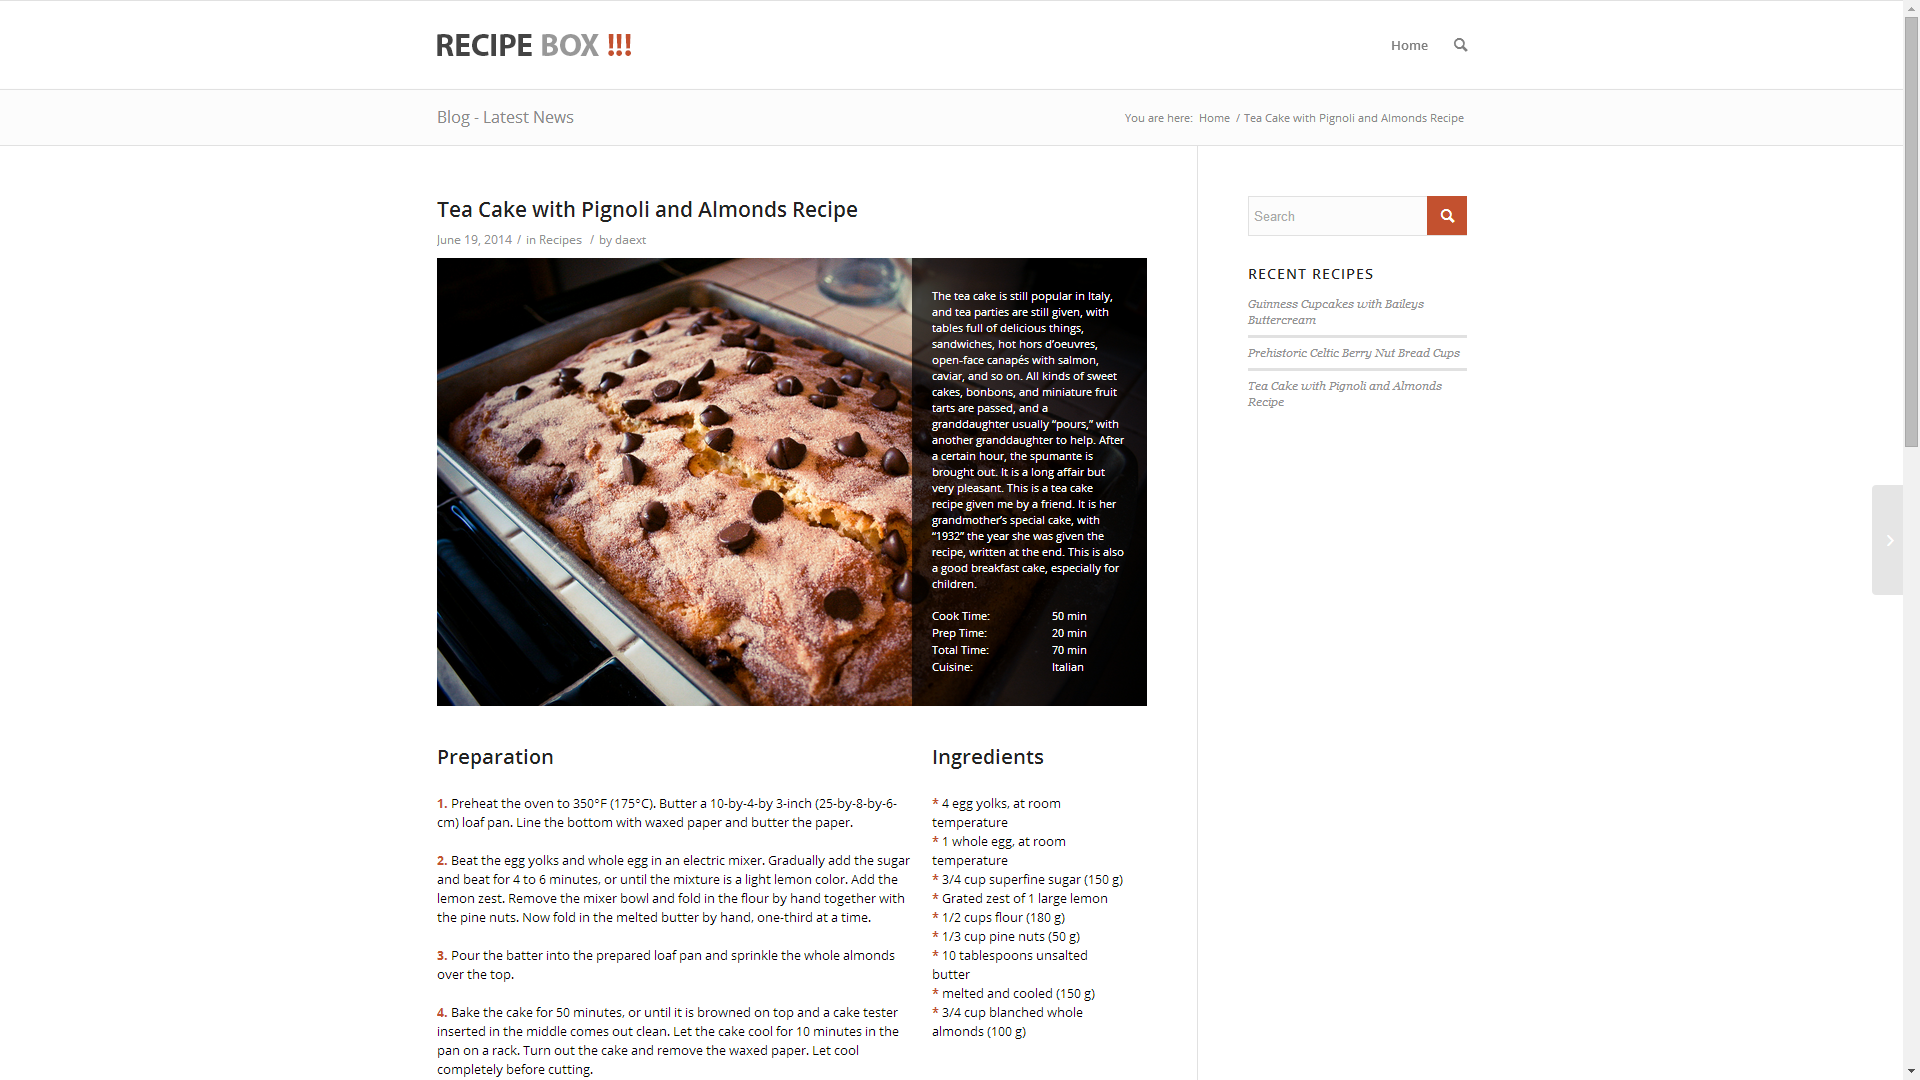 Recipe box recipe plugin for wordpress by daext codecanyon meta box 1g meta box 2g options 1g options 2g options 3g options 4g options 5g options 6g forumfinder Choice Image